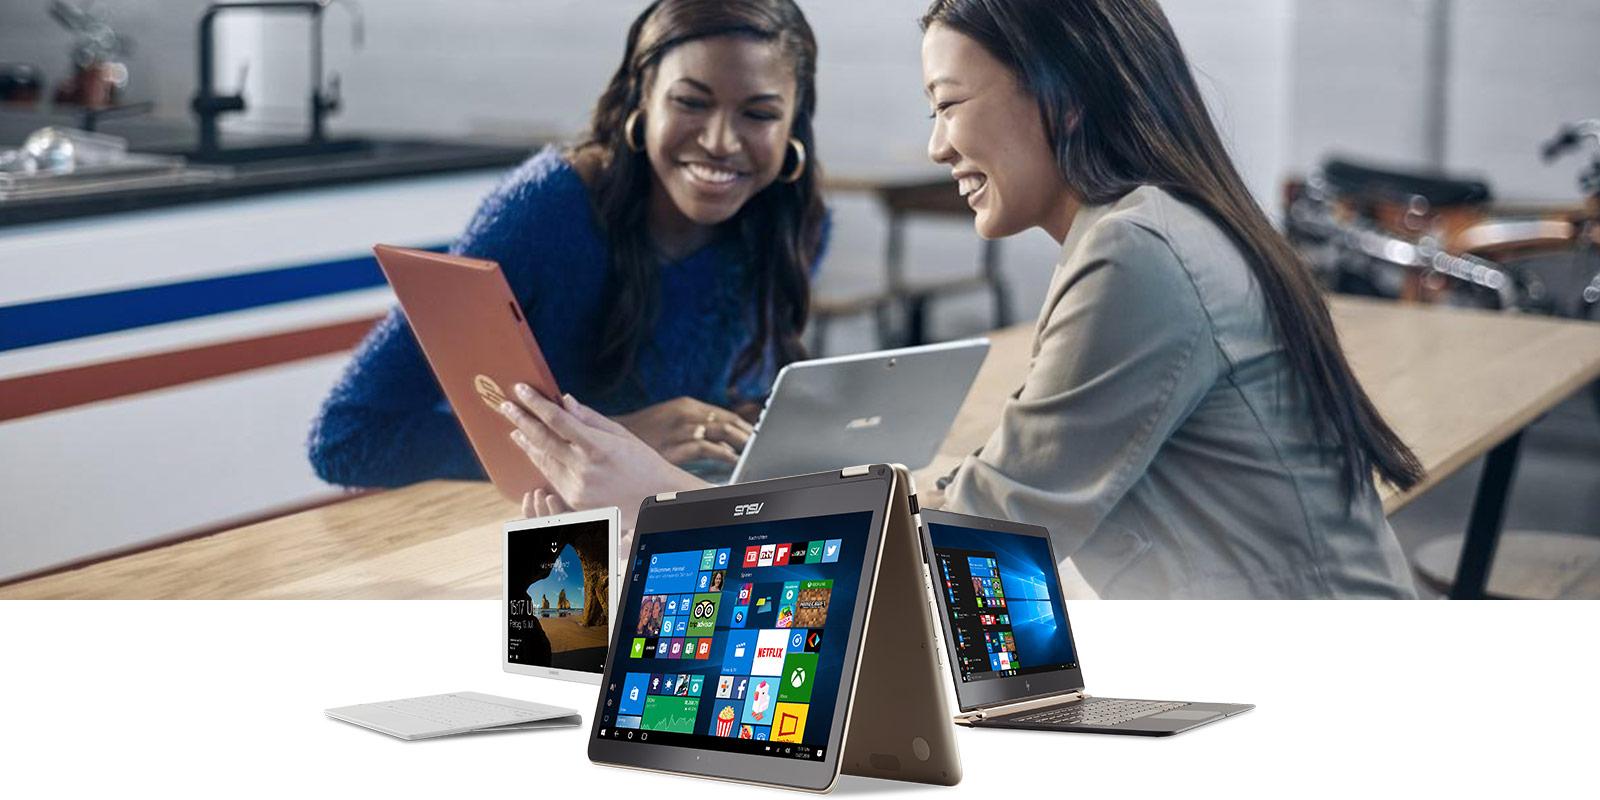 Windows10-PCs und -Tablets